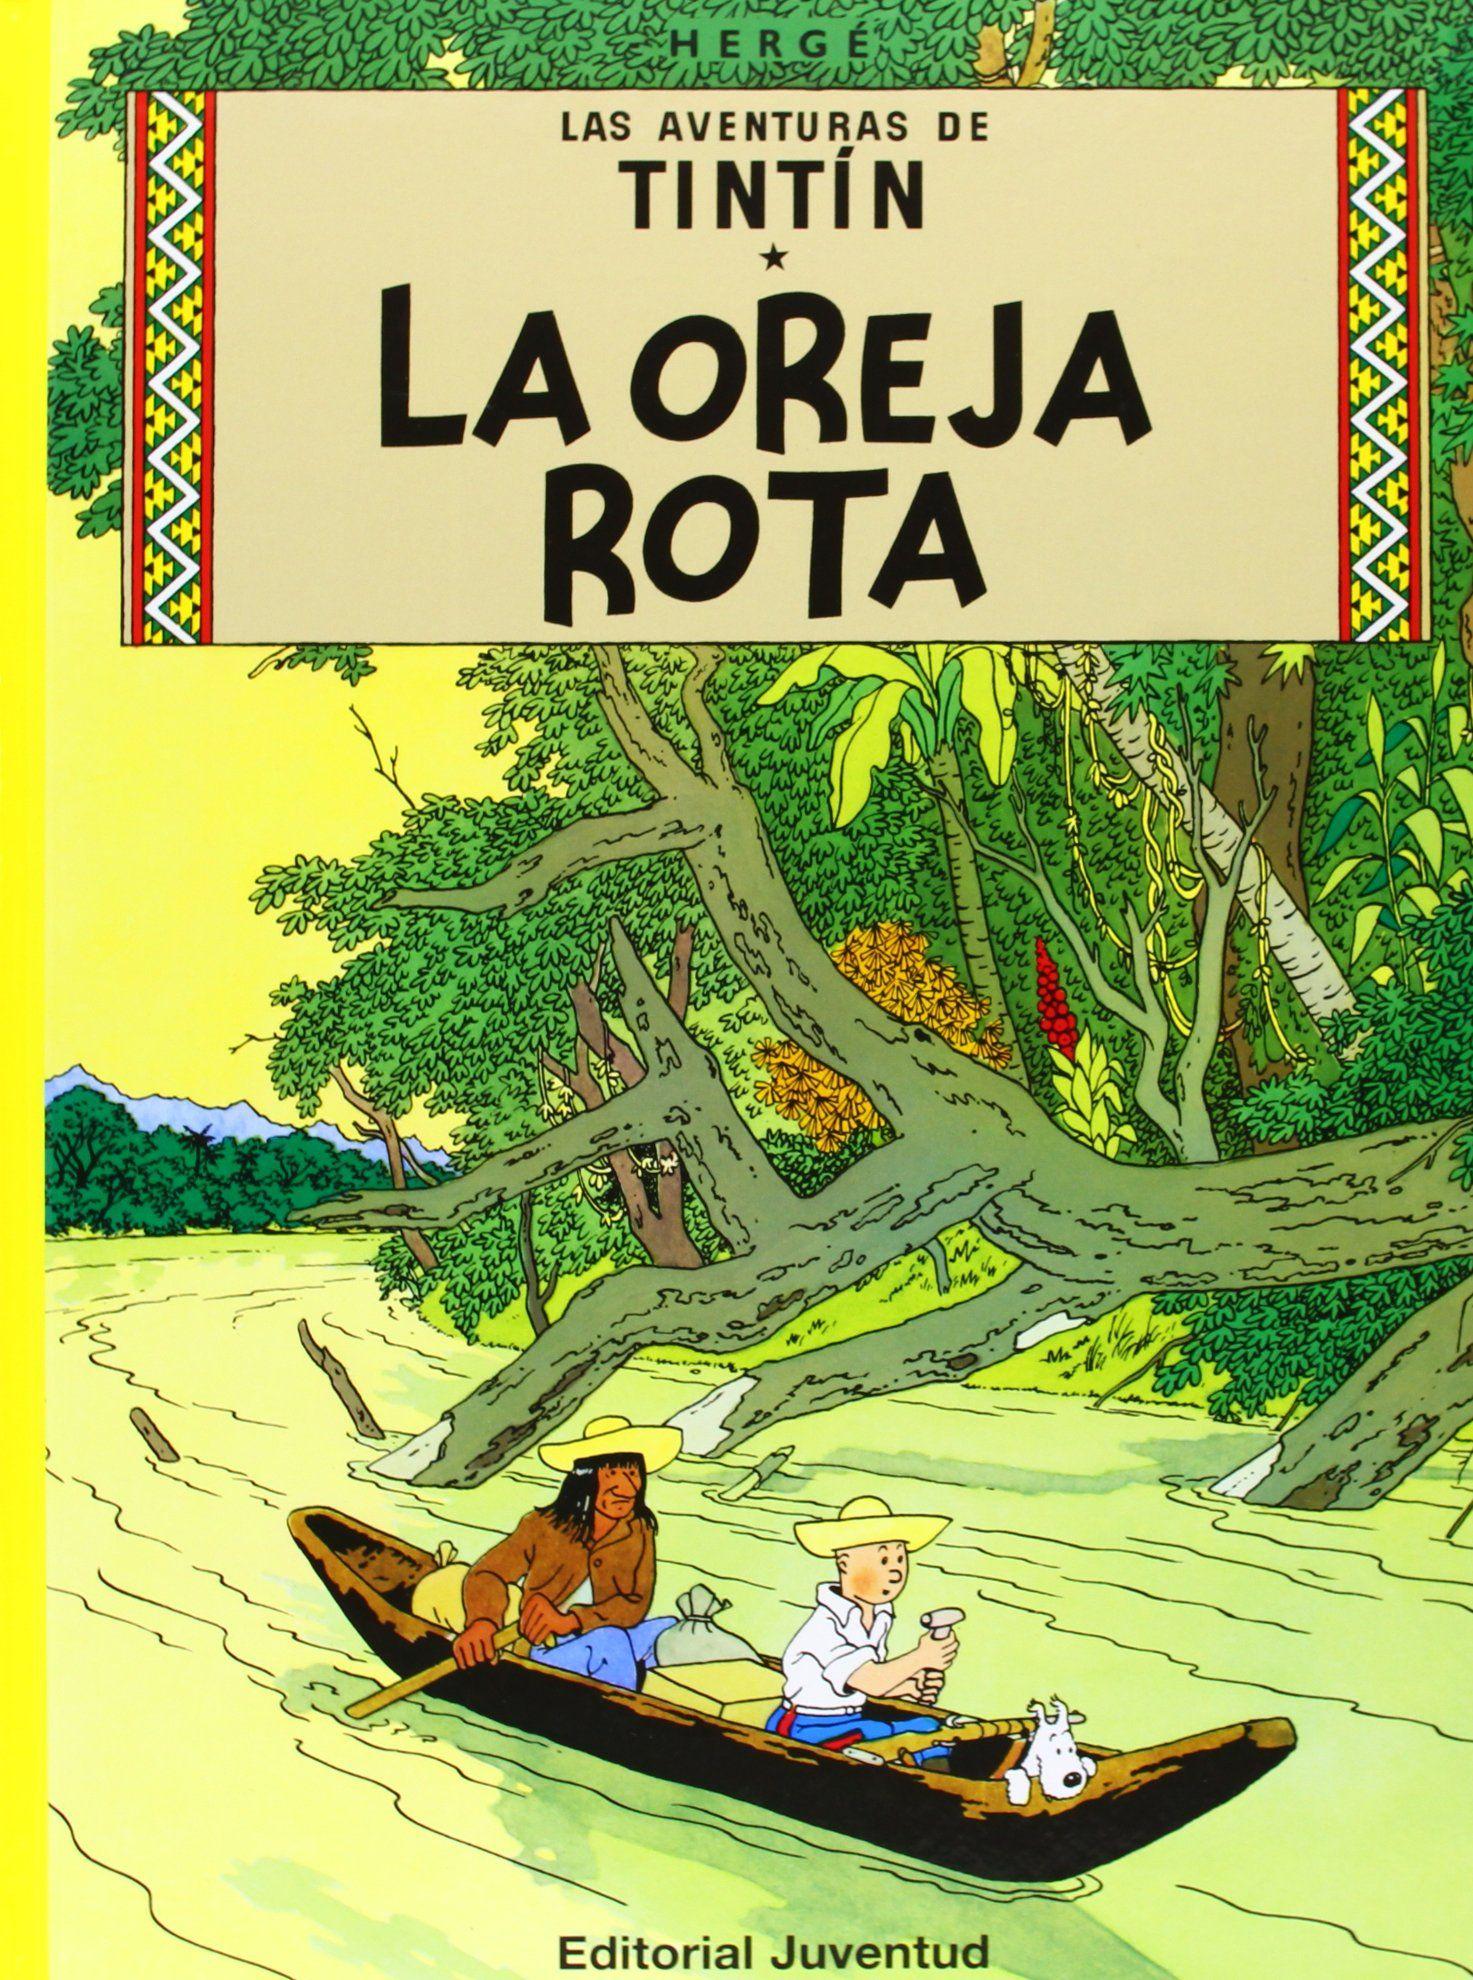 (spanish) La oreja rota (L'Oreille cassée) es un álbum de